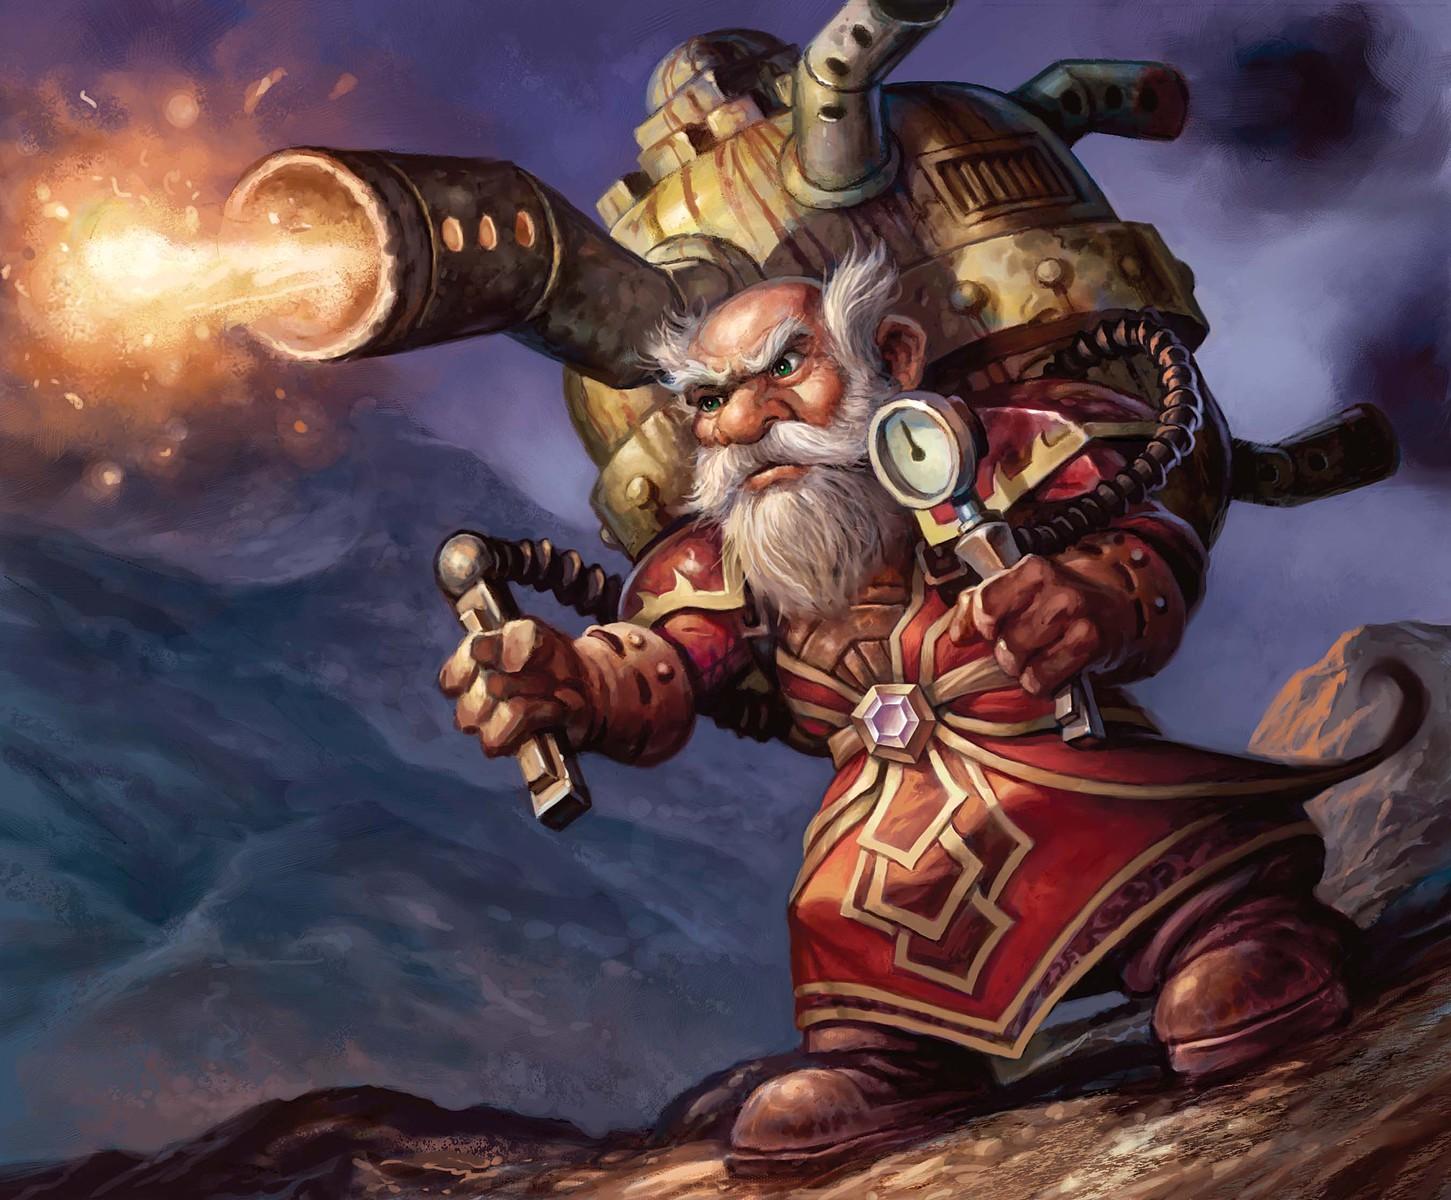 World of warcraft dwarf sex gallery adult scenes